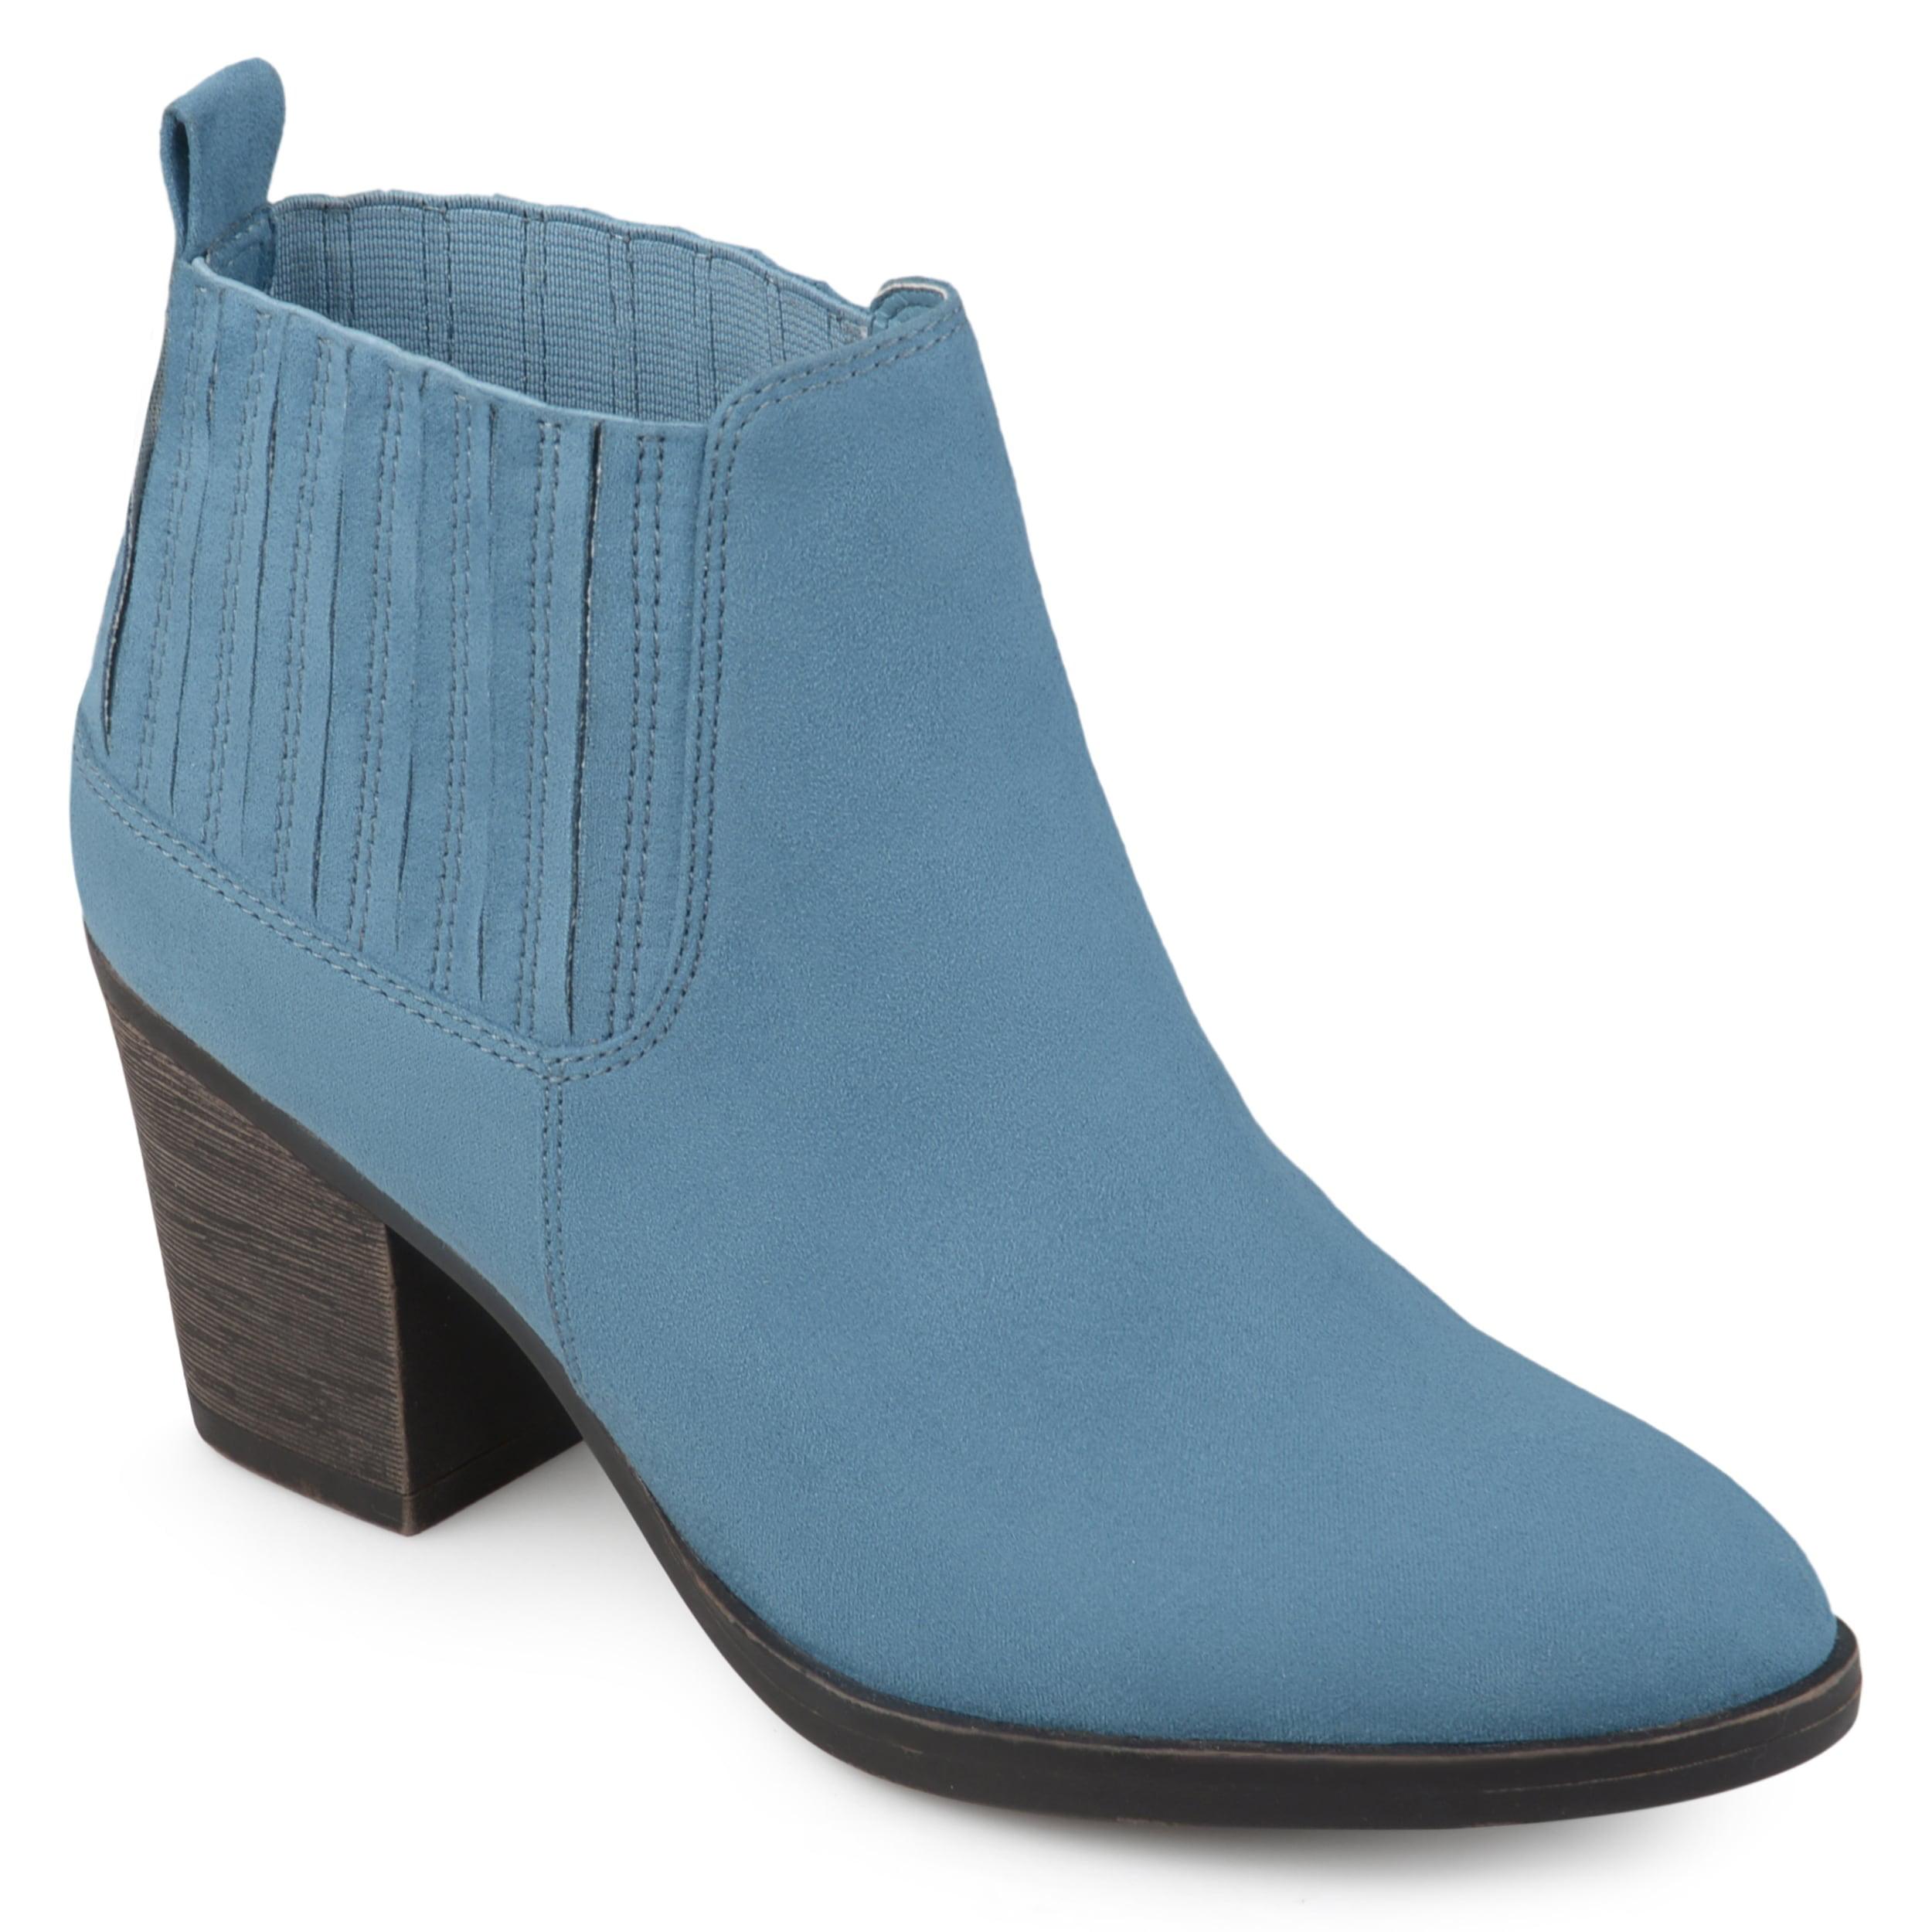 Journee Collection  Women's 'Sero' Almond-toe Block Heel ...